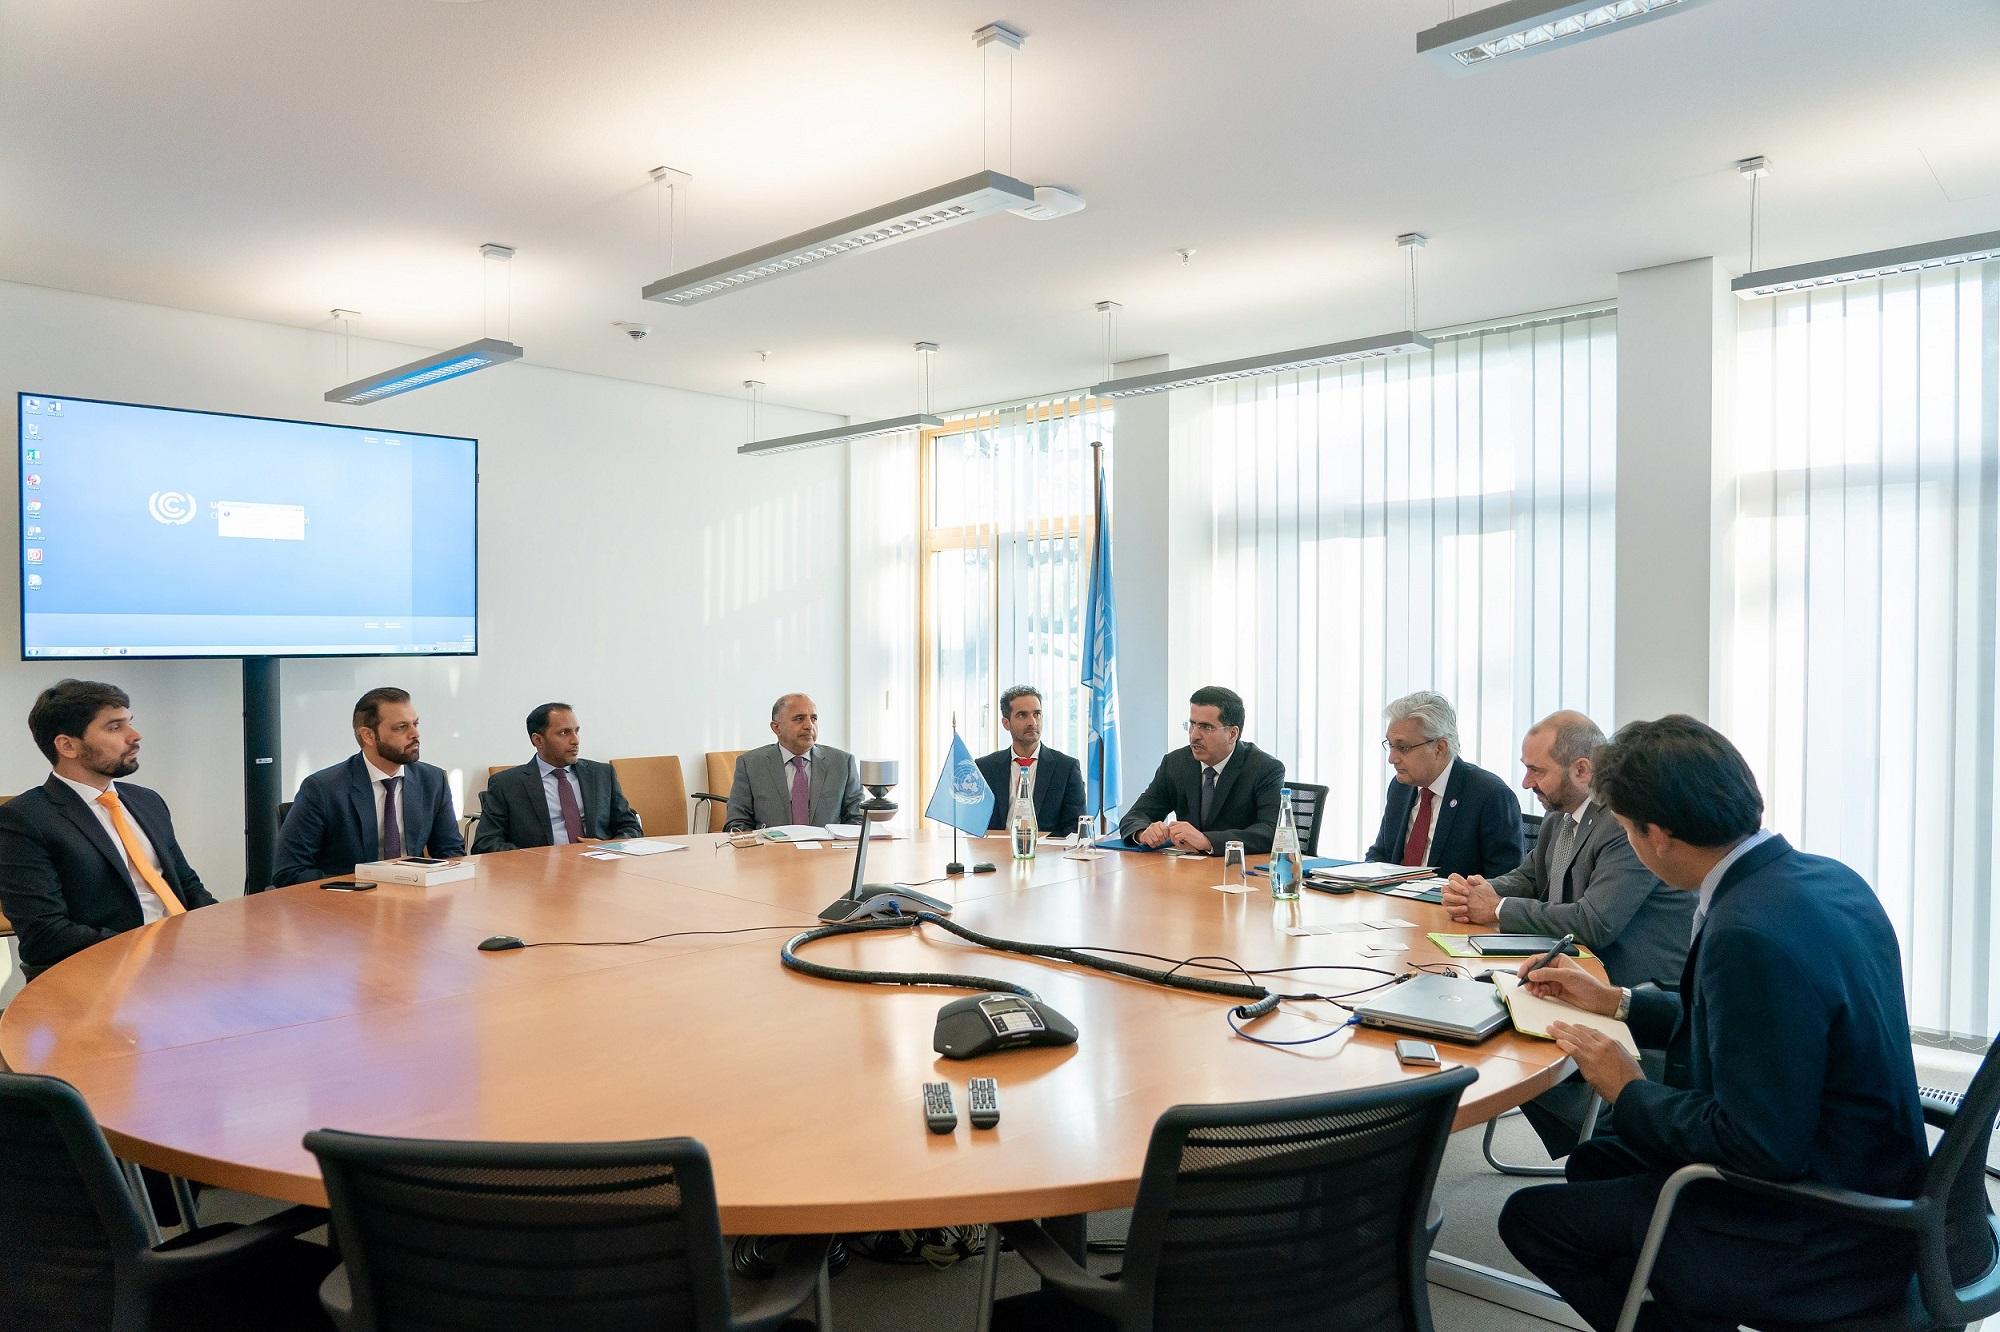 wgeo chairman, unfccc deputy executive secretary discuss cooperation 1